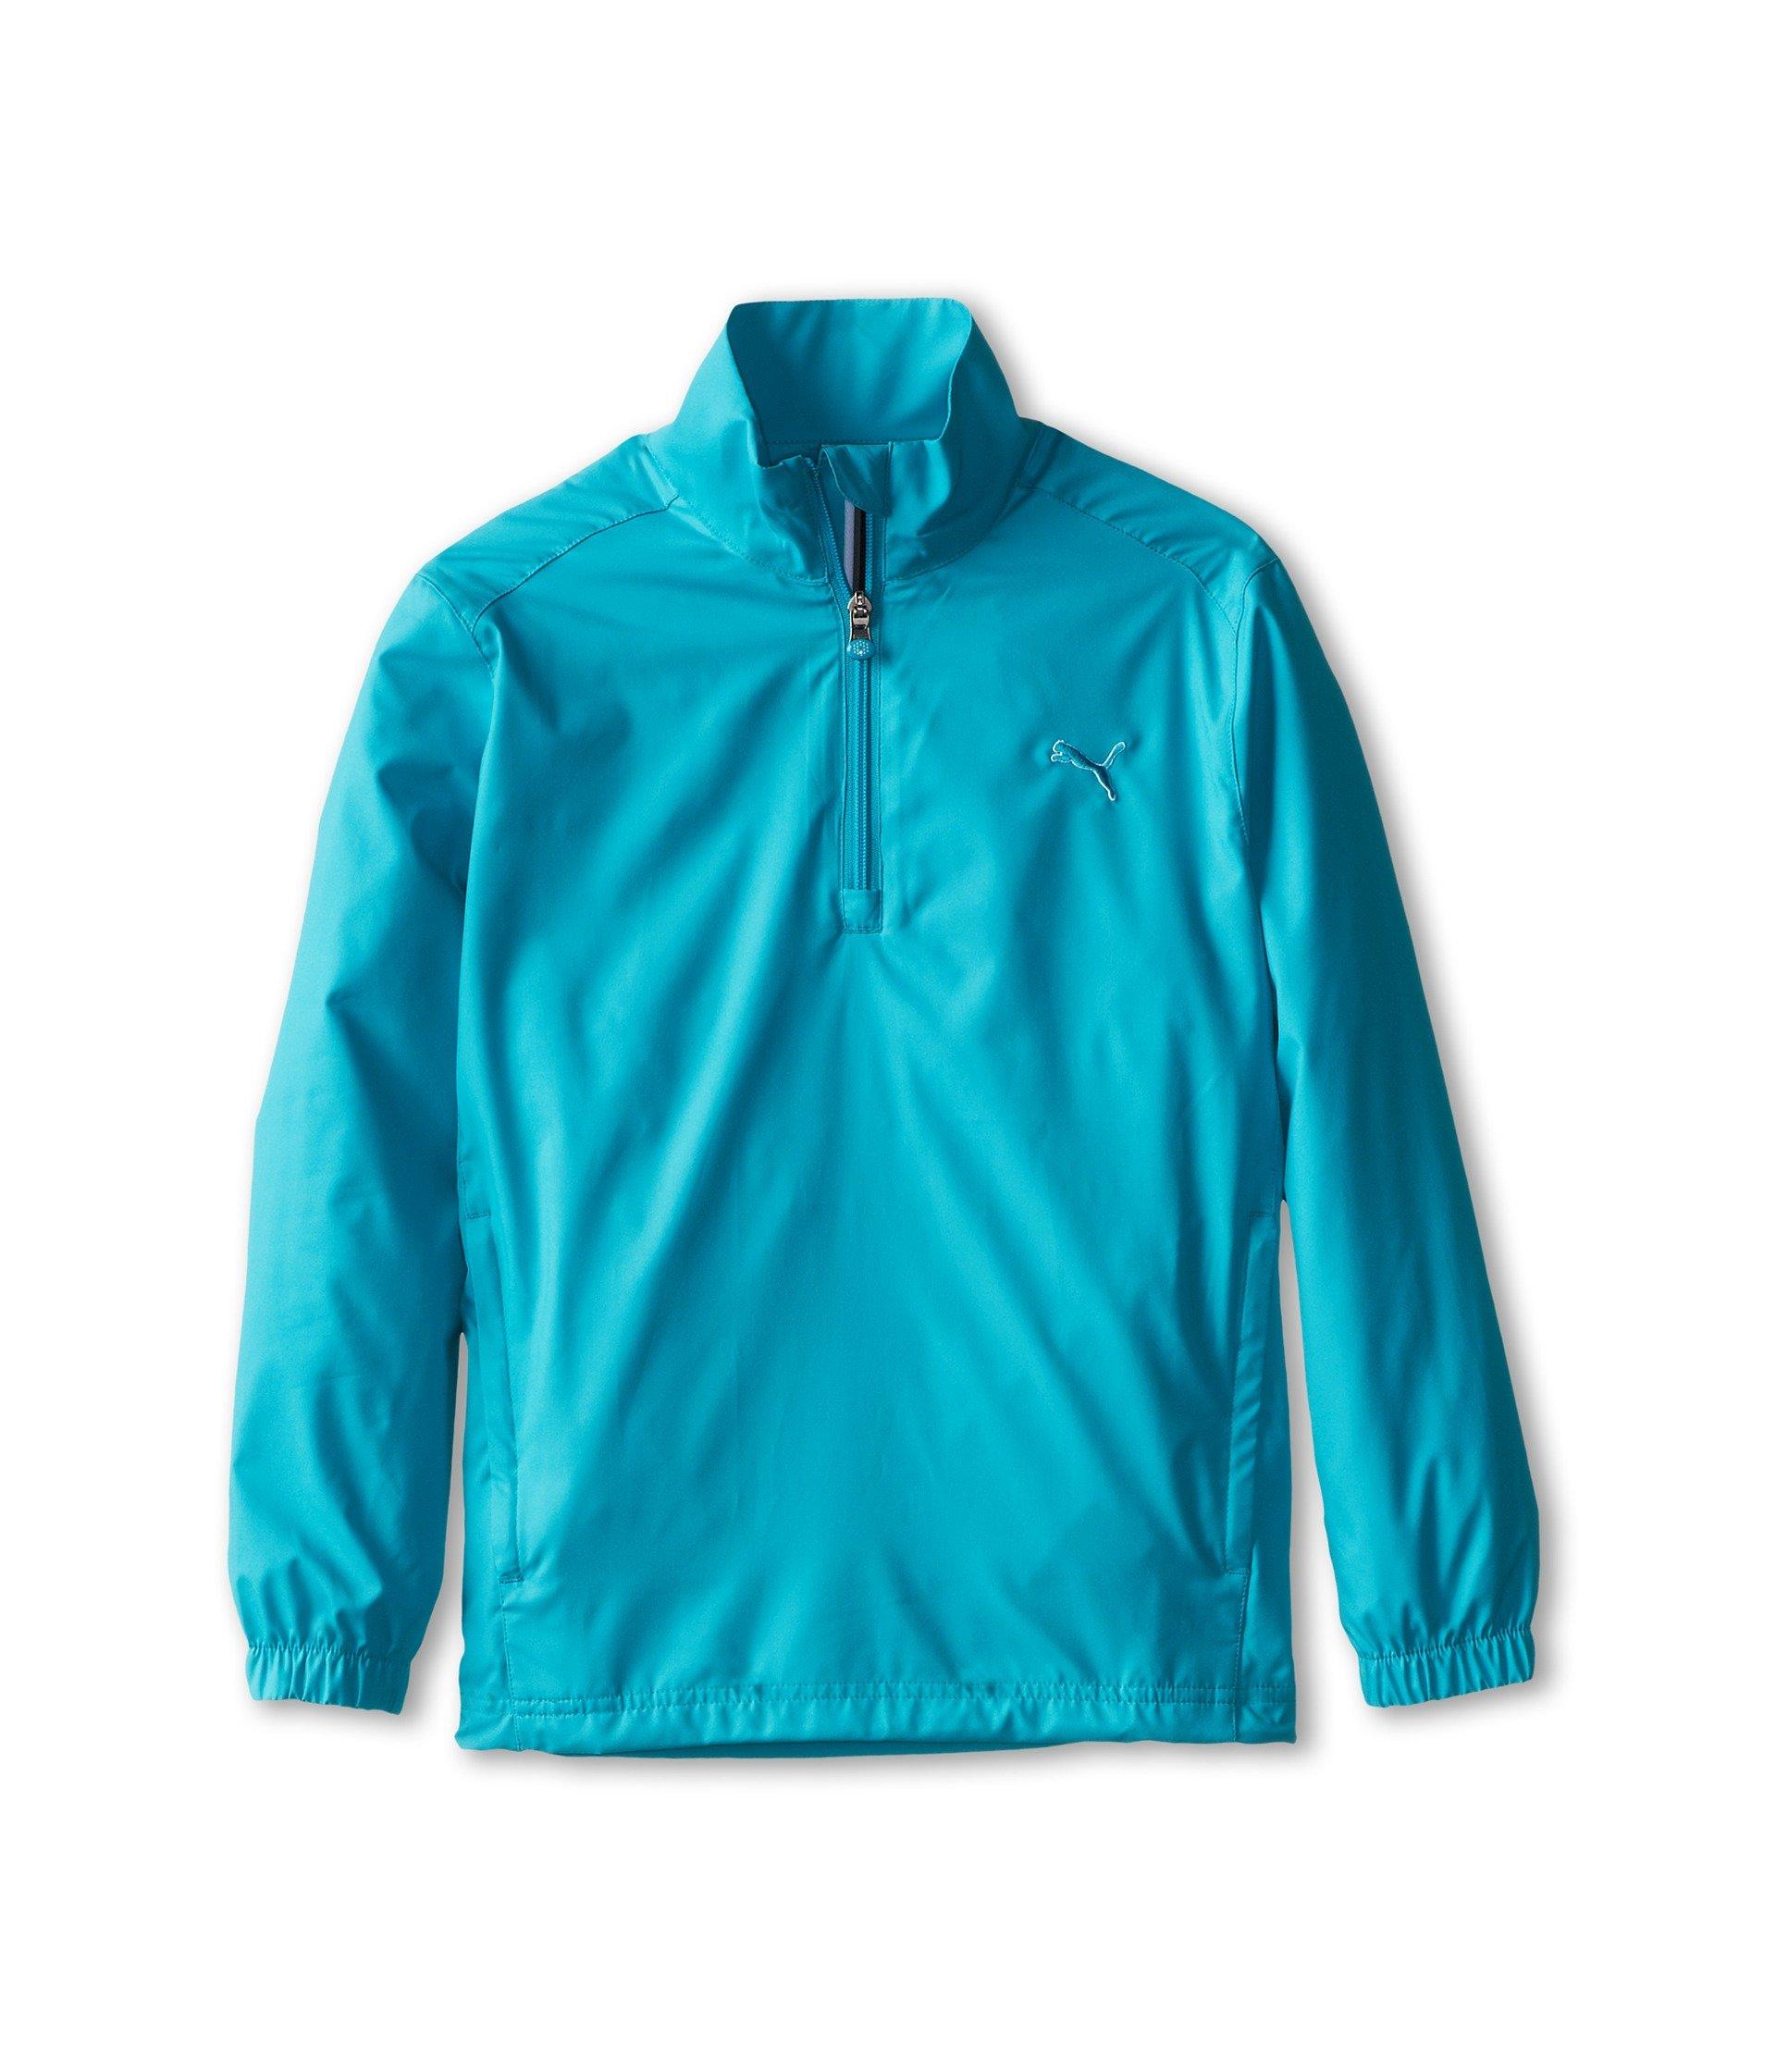 PUMA Golf NA Boy's Junior 1/2 Zip Wind Jacket, Bluebird, Small by PUMA